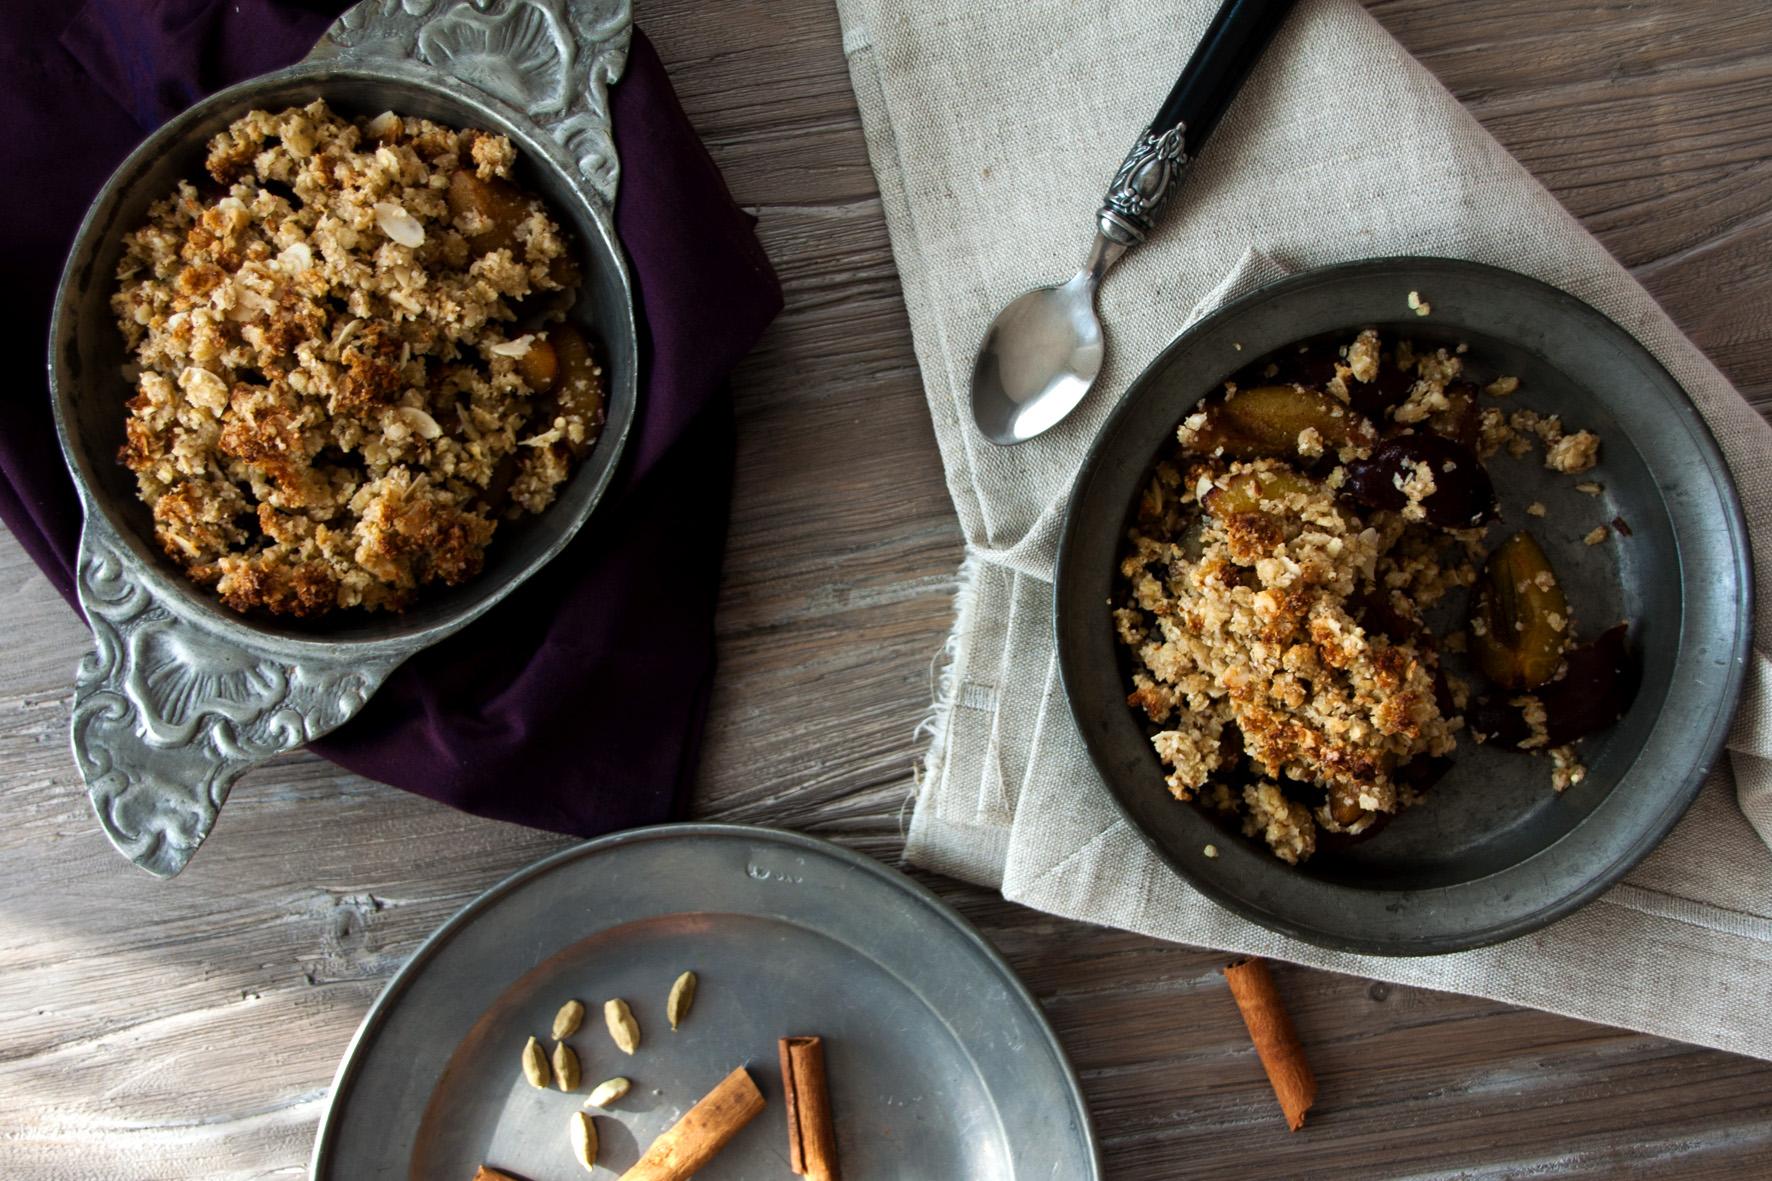 Pflaumen-Crumble-Quinoa-Buchweizen-3